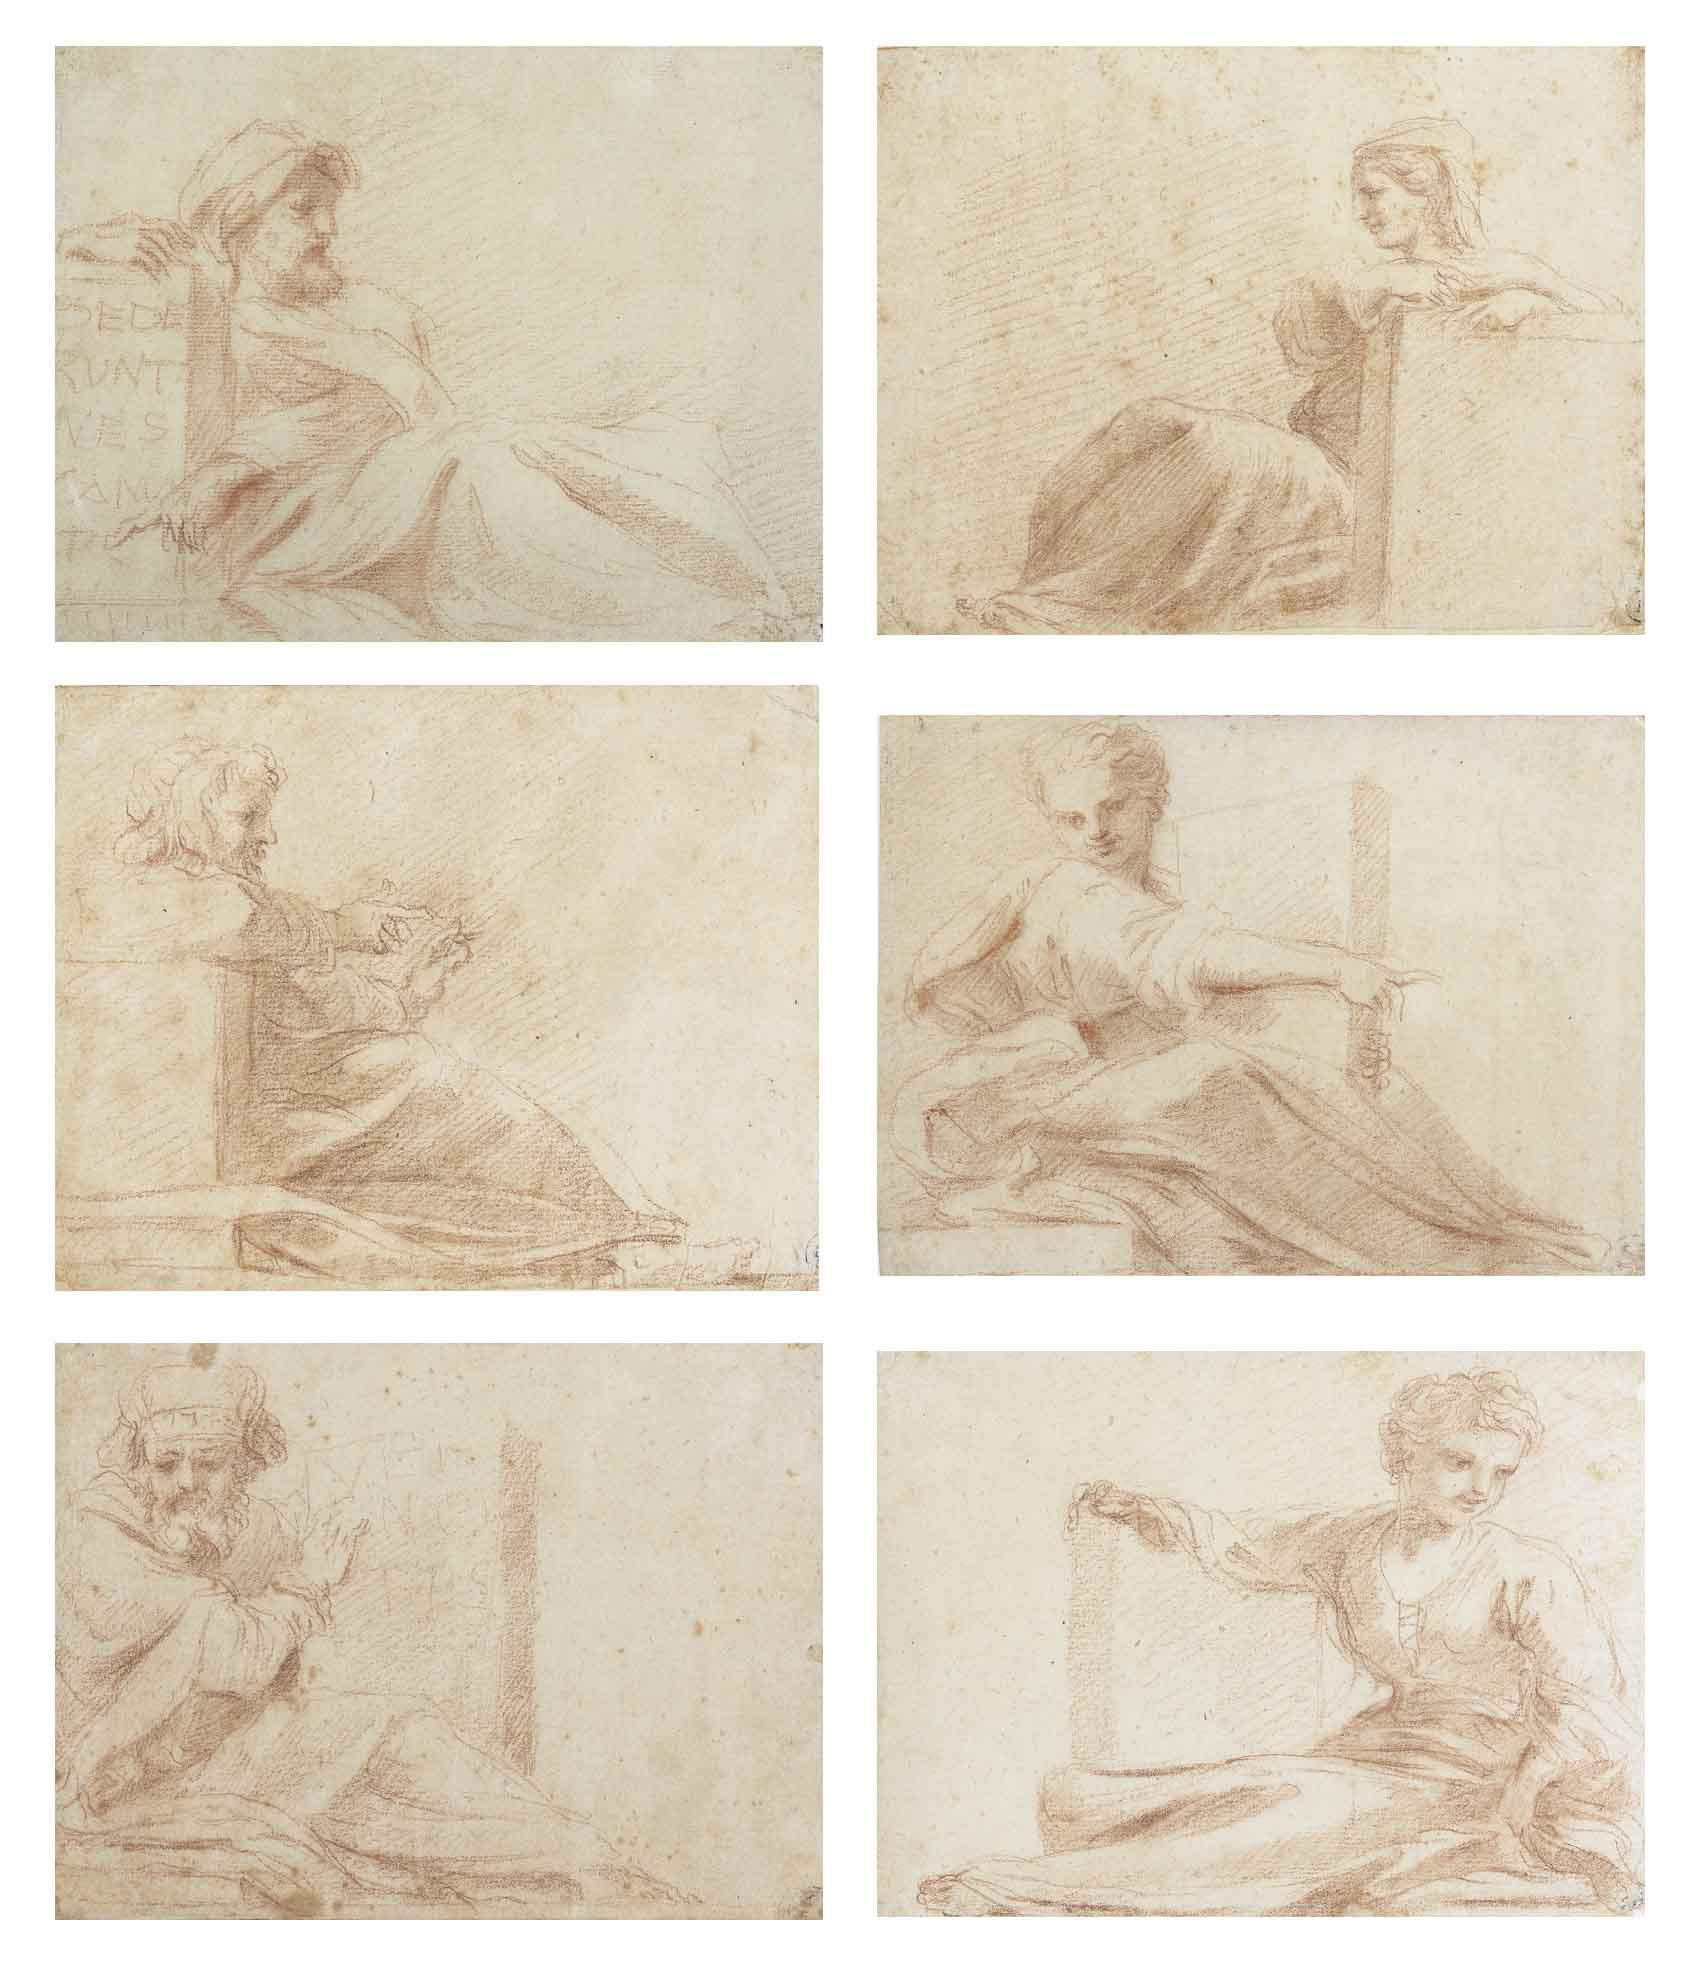 Michelangelo Anselmi (Lucca 14